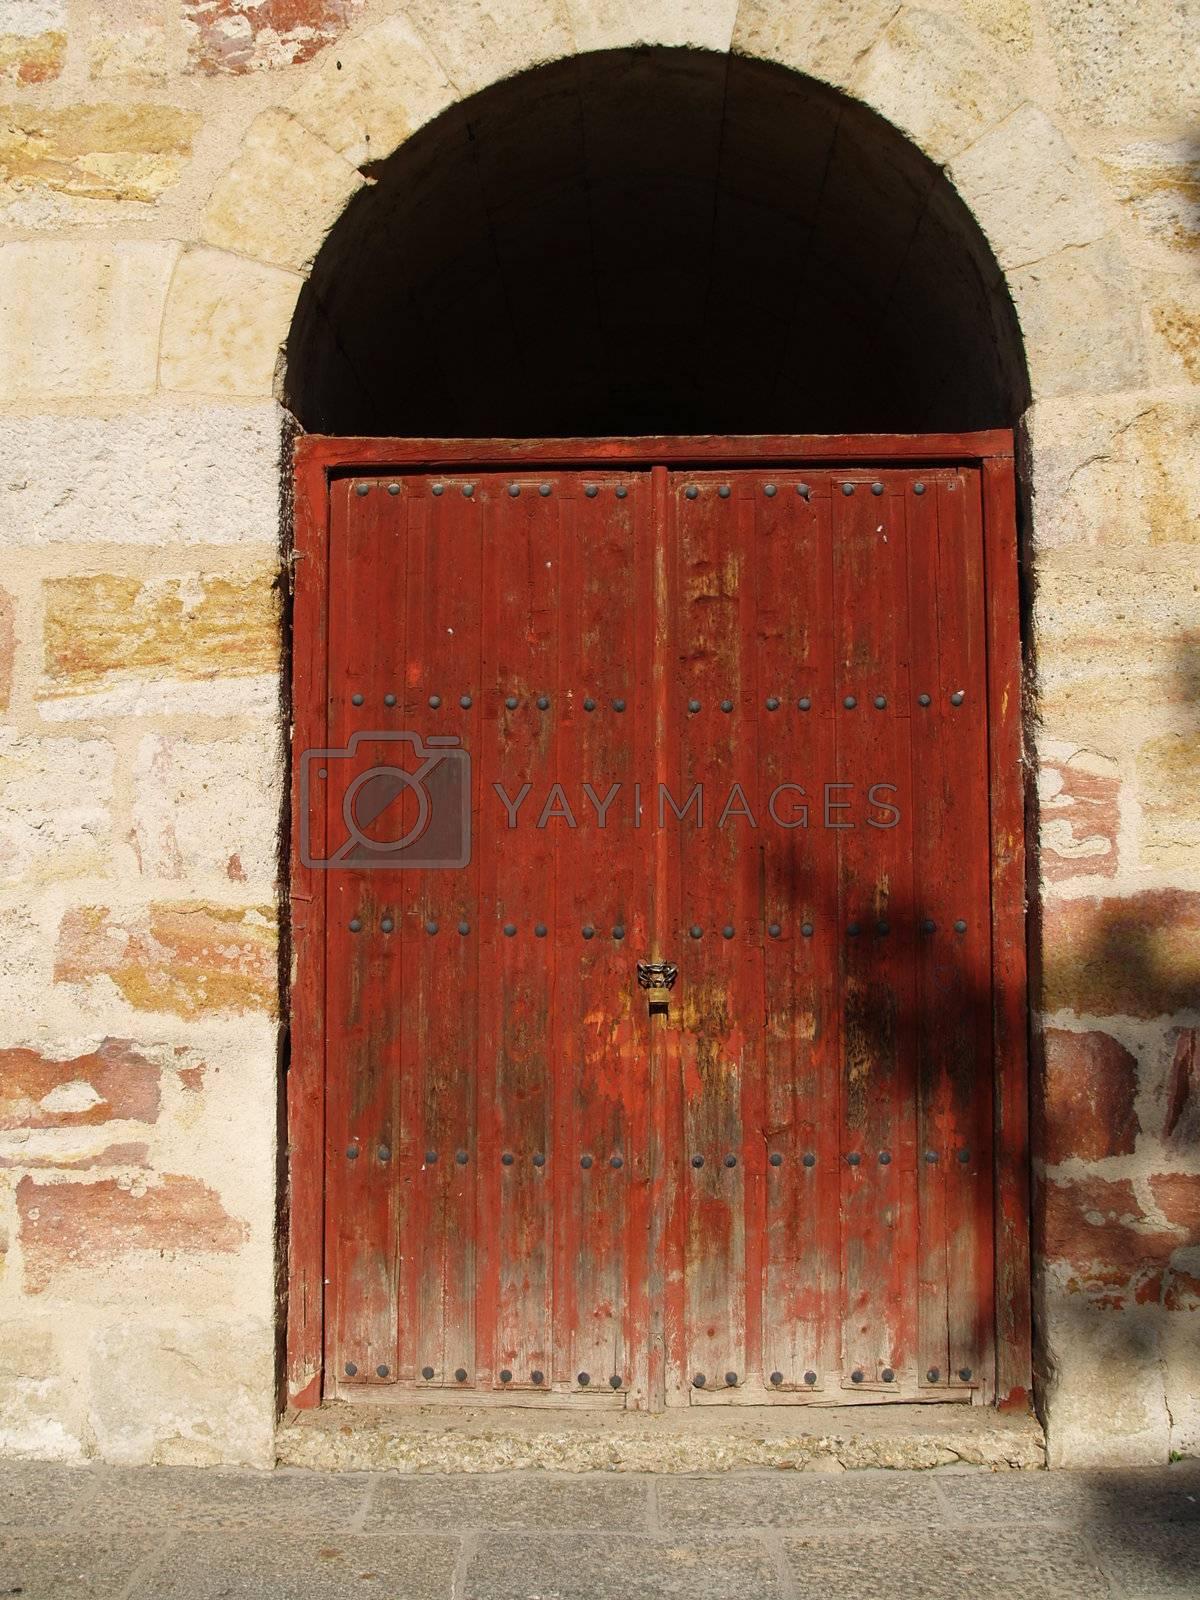 View on an old door.